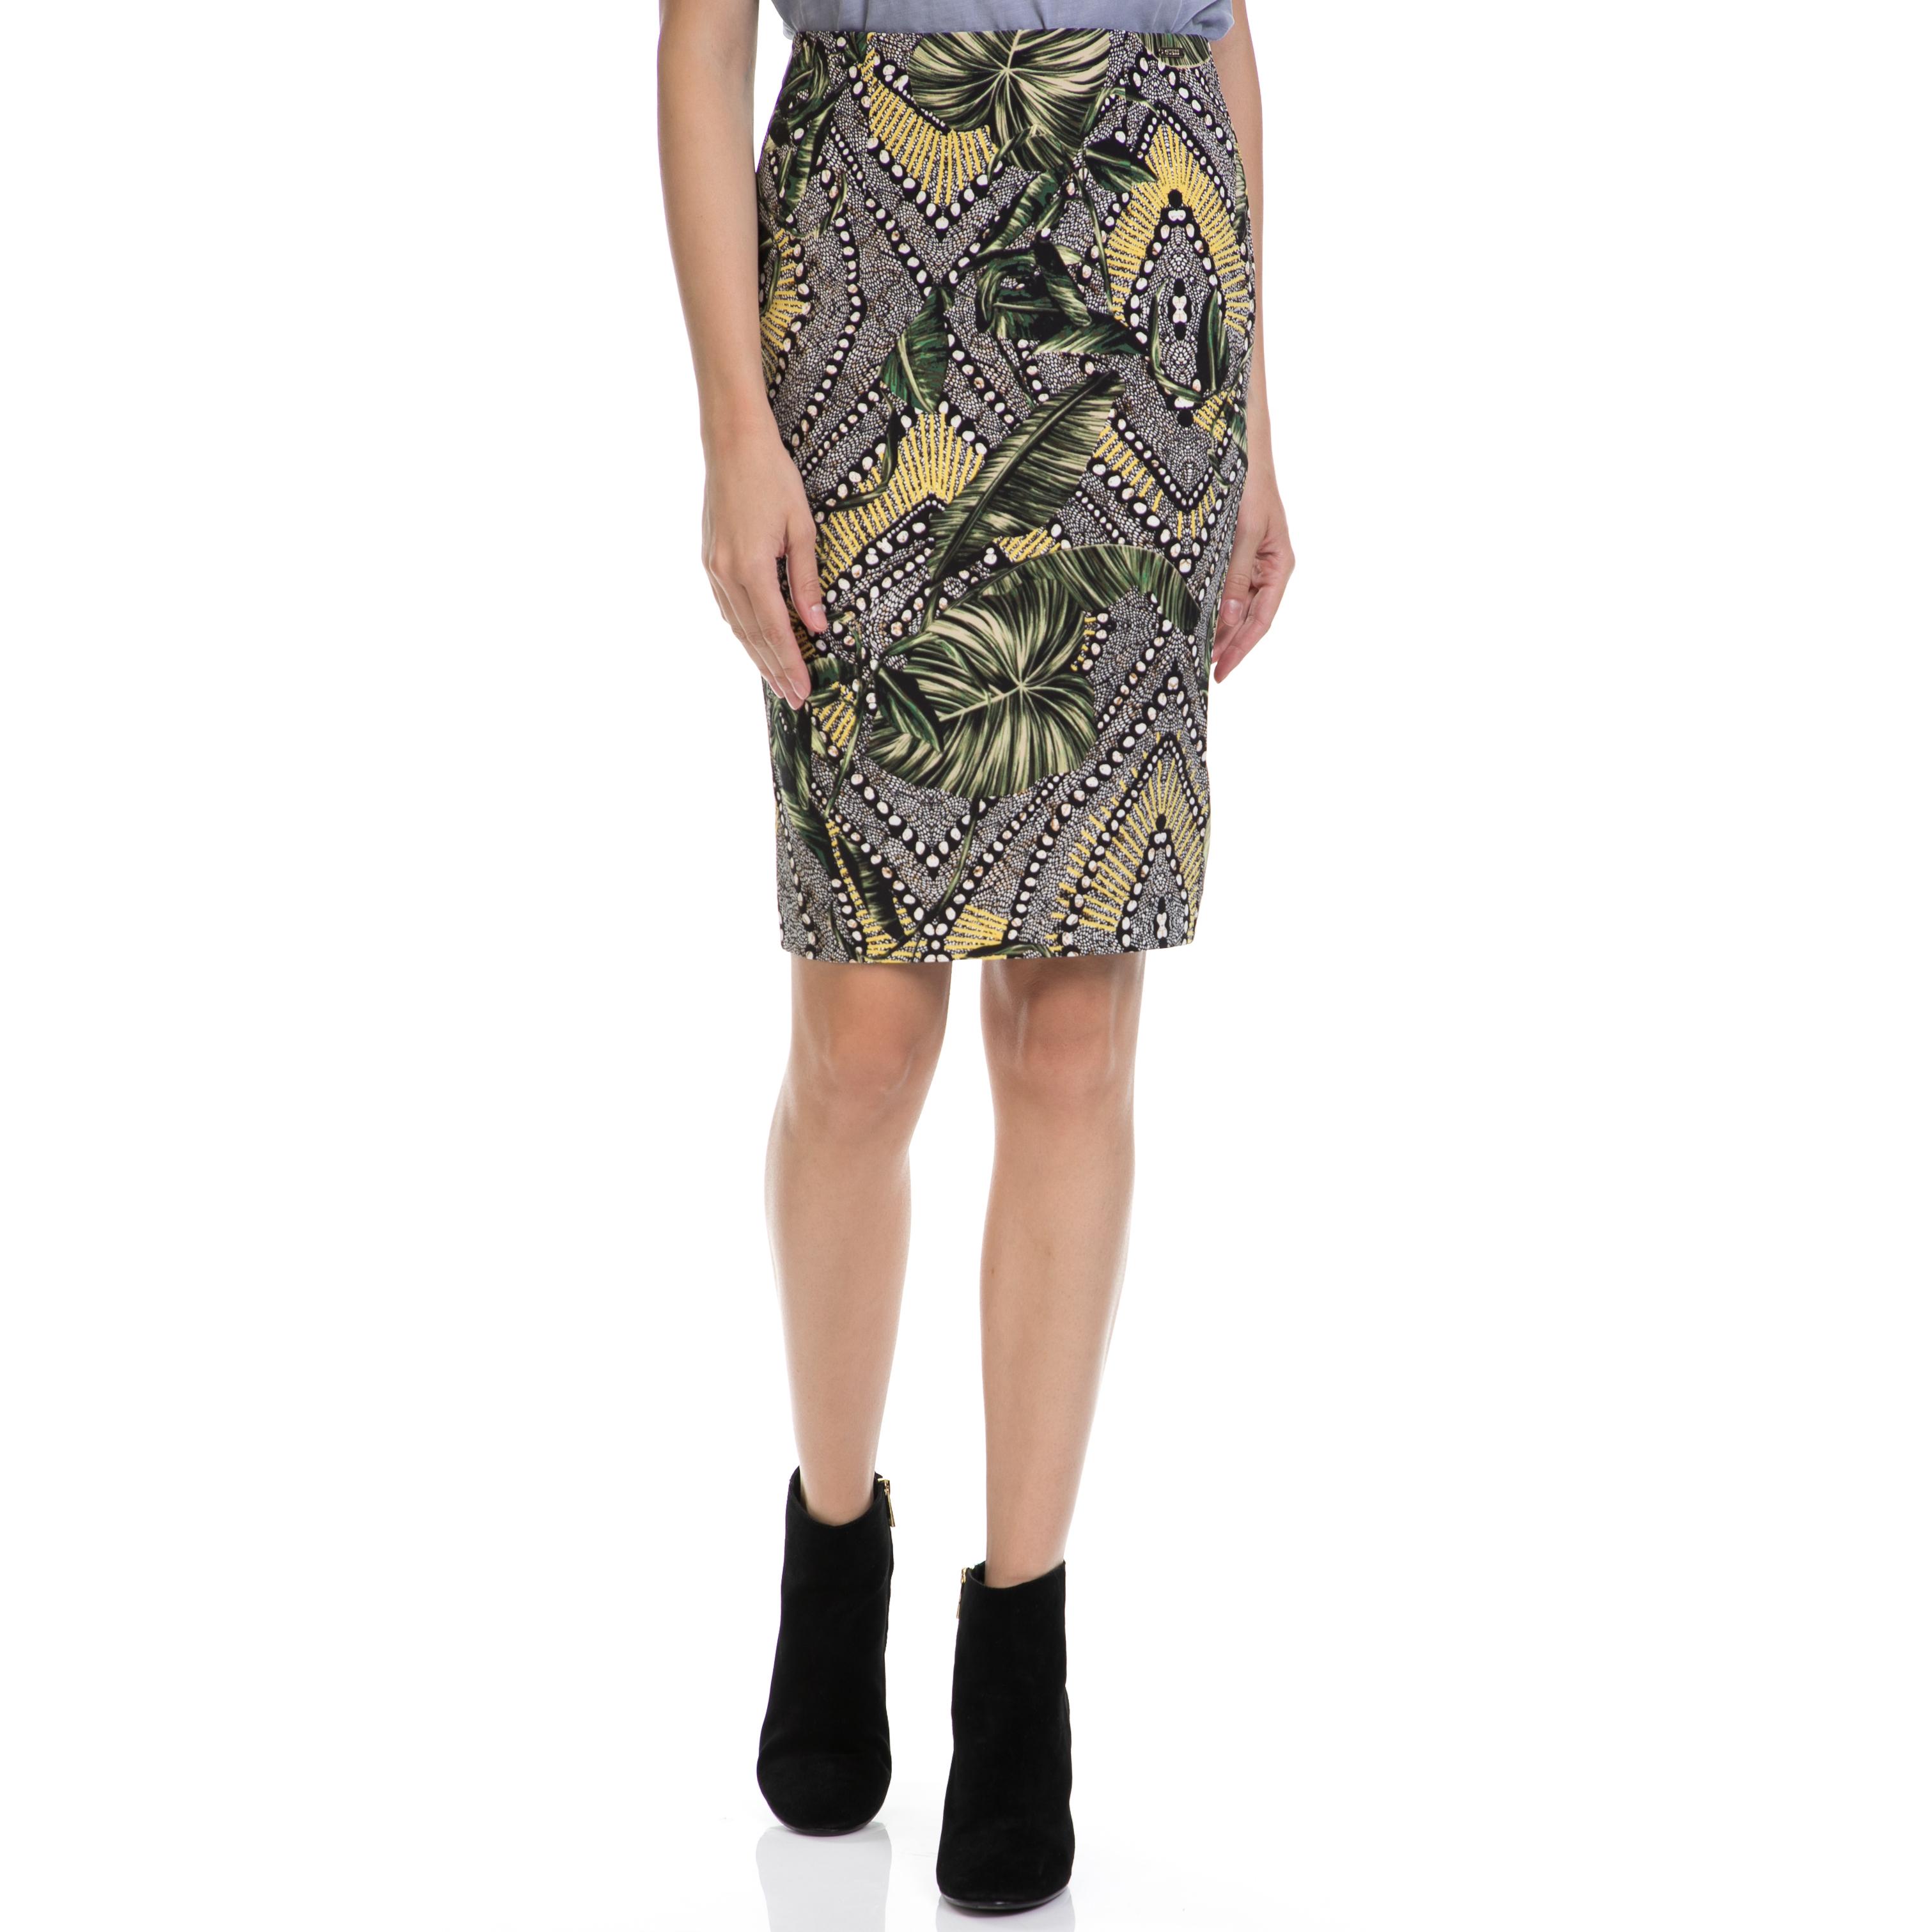 GUESS - Γυναικεία φούστα GUESS εμπριμέ γυναικεία ρούχα φούστες μέχρι το γόνατο